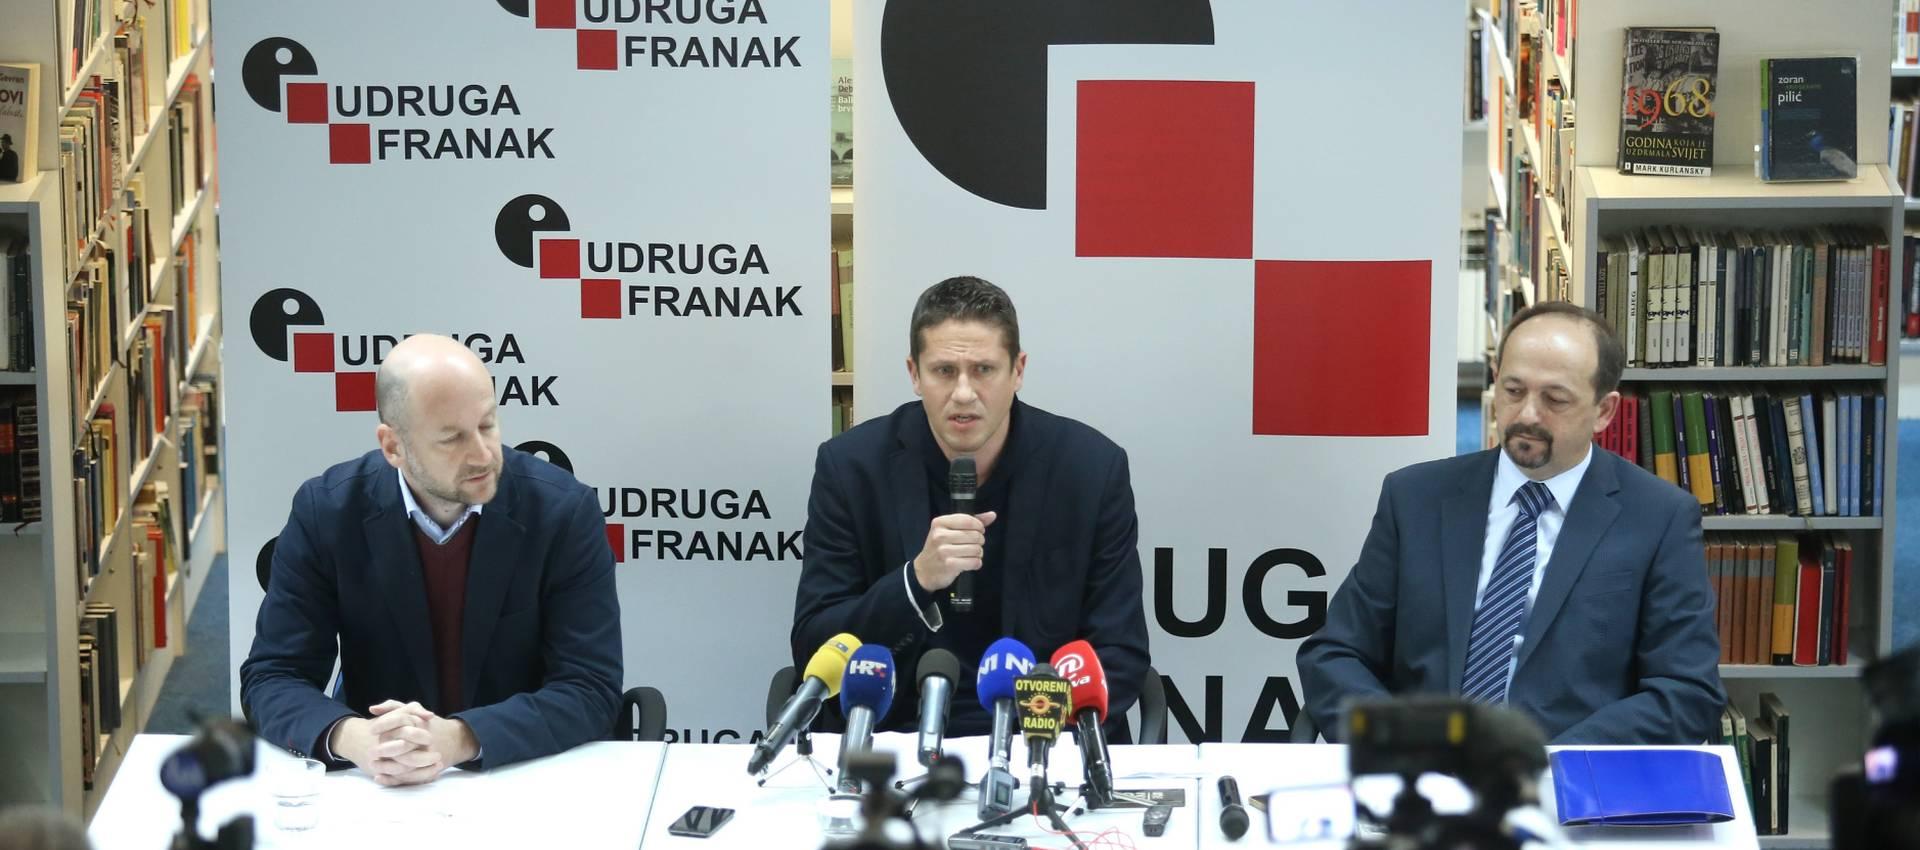 Udruga Franak: Članstvo pozdravlja napore Vlade